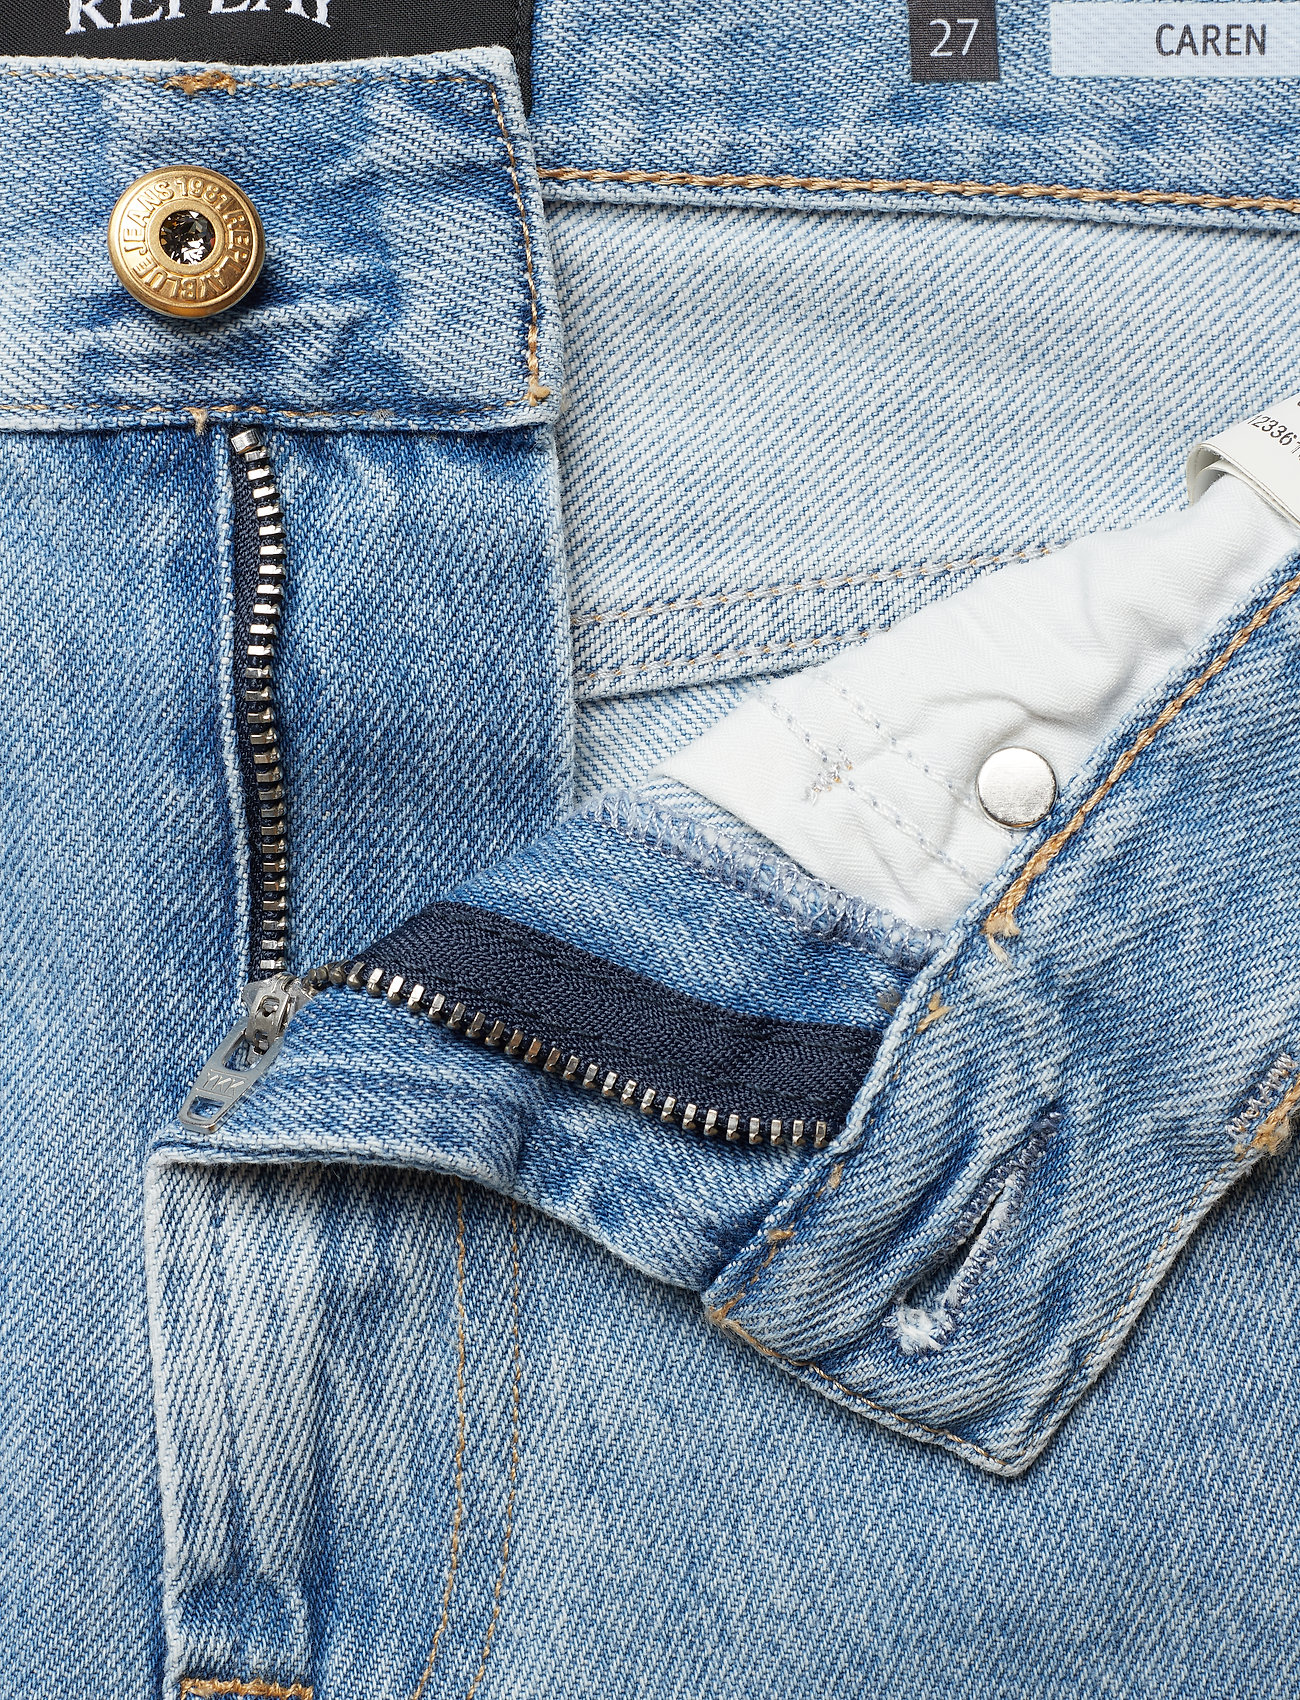 Replay CAREN - Jeans LIGHT BLUE - Dametøj Særtilbud